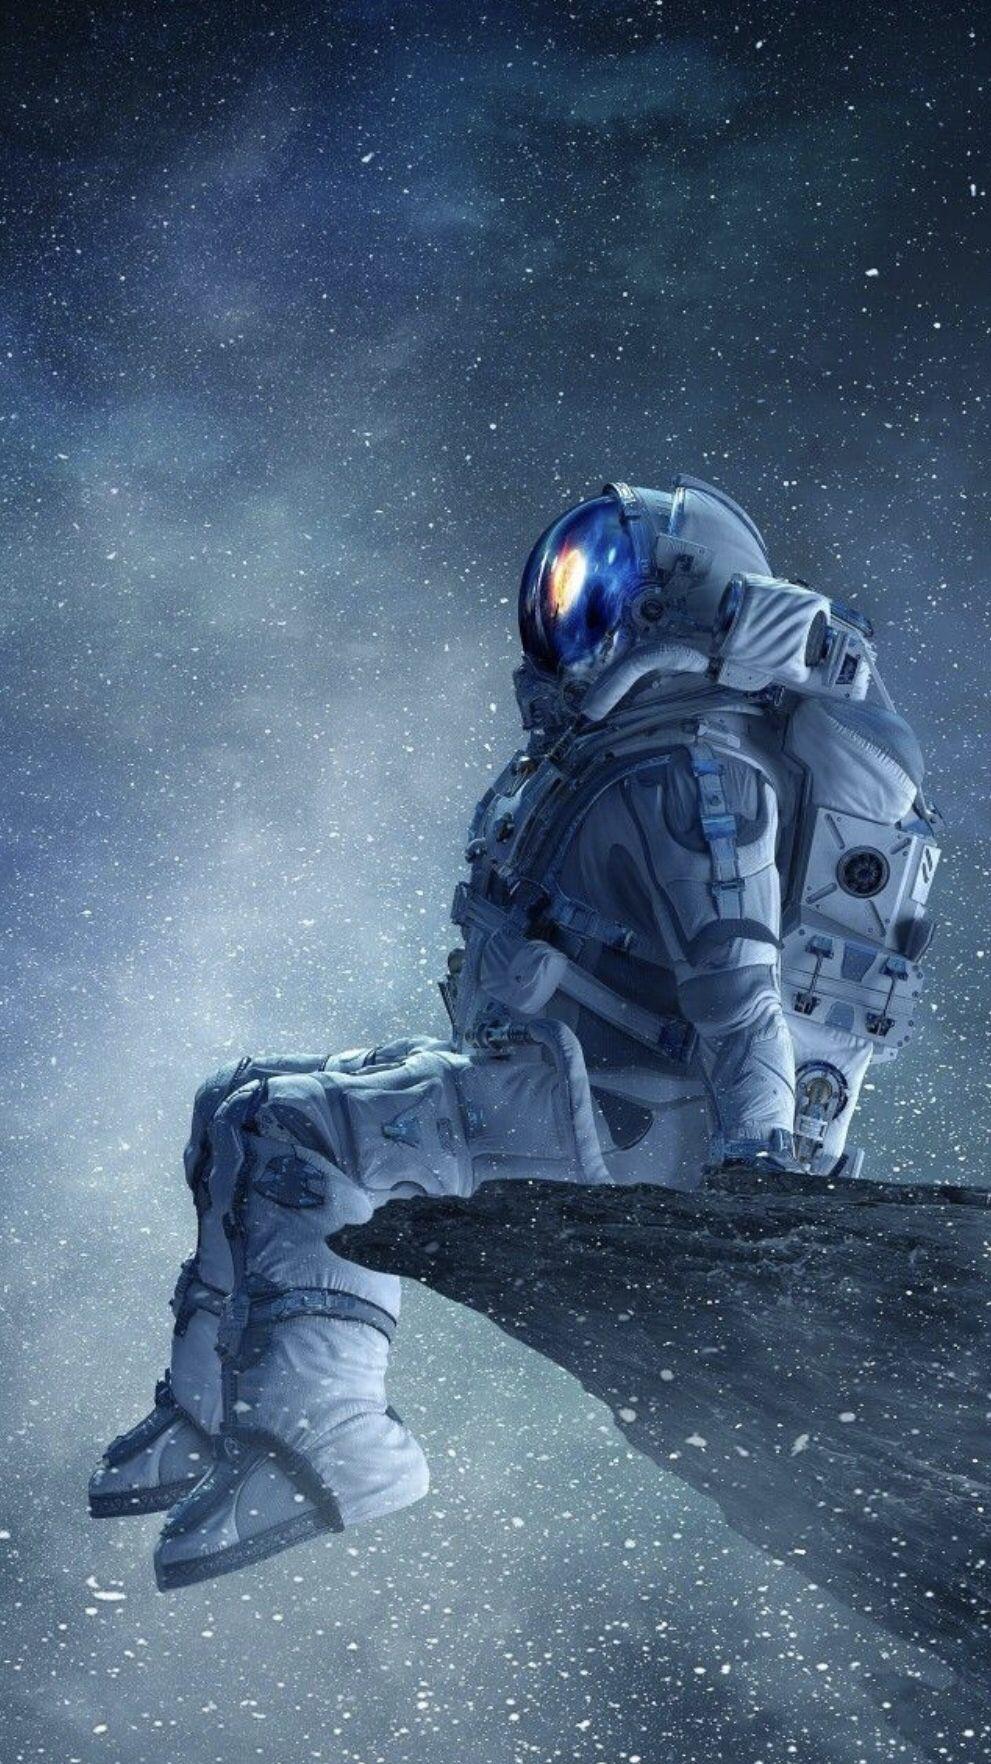 In The Stars Galaxy Wallpaper Uzayda Yolculuk Illustrasyon Posterleri